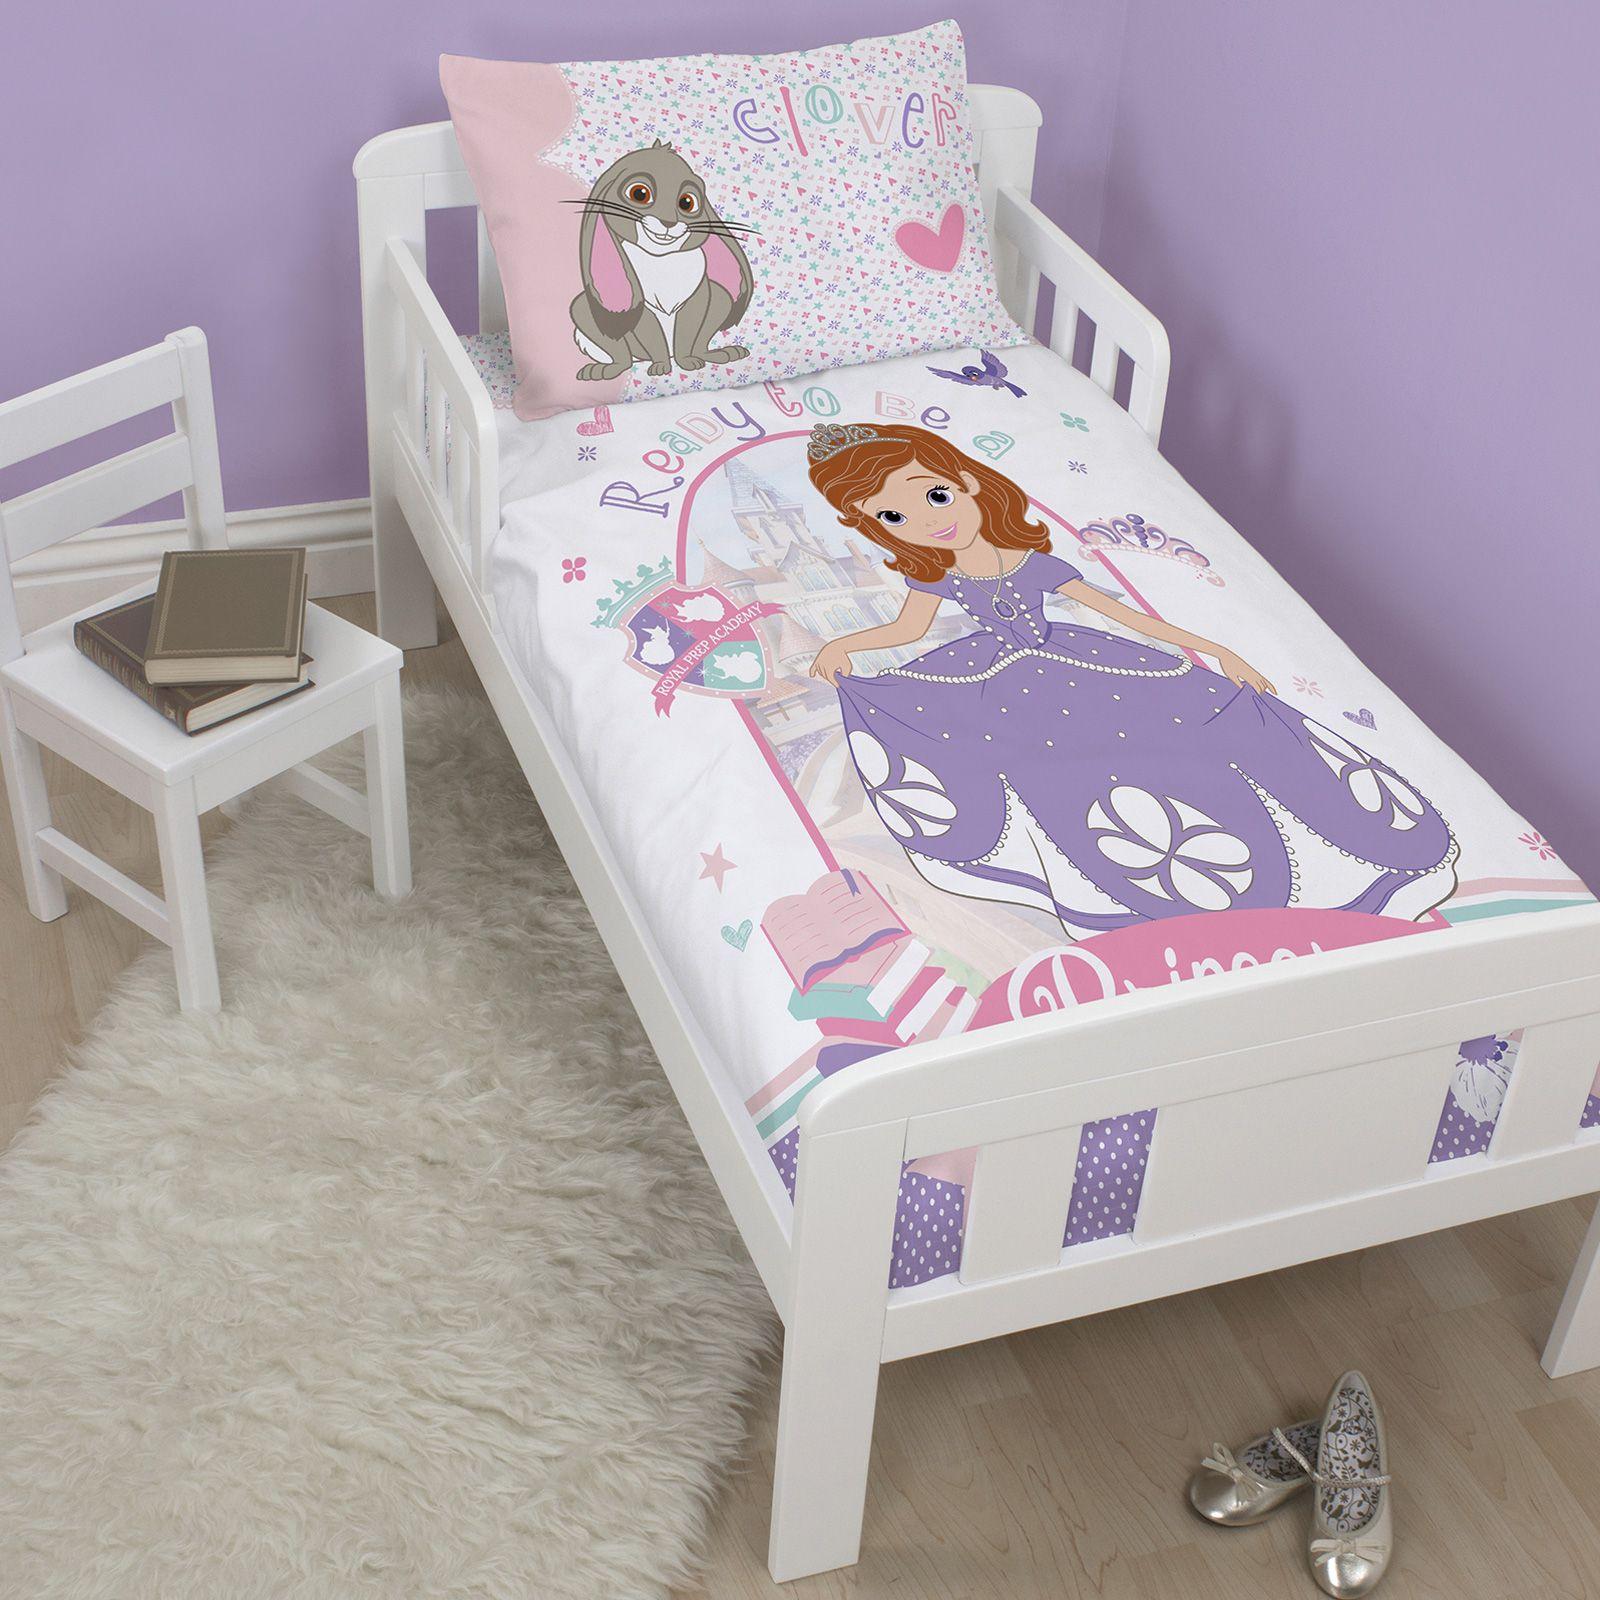 personnage disney lit b b junior housse couette literie. Black Bedroom Furniture Sets. Home Design Ideas